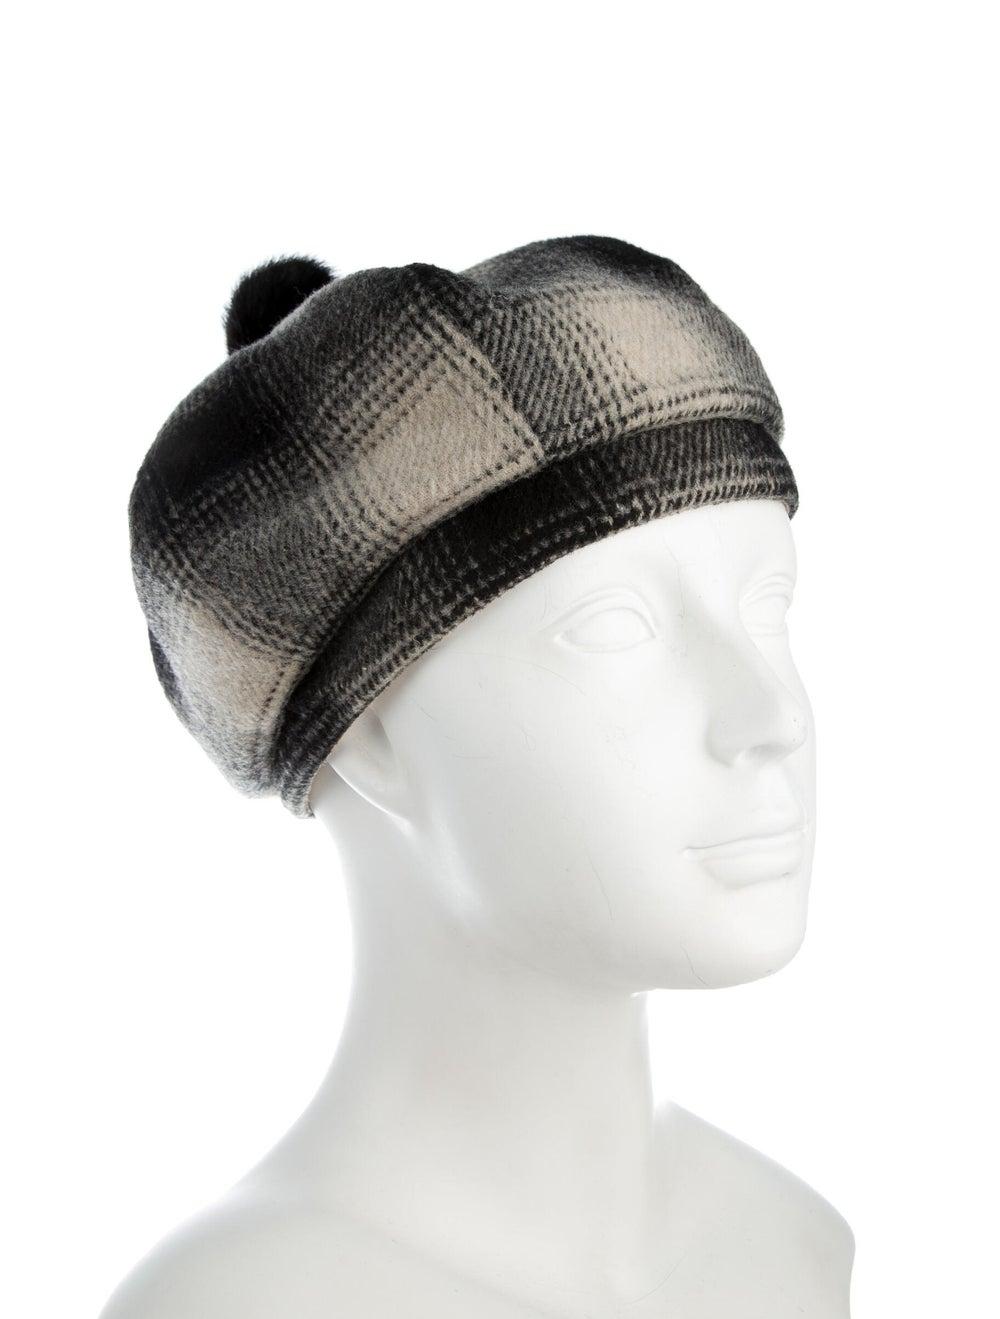 Eugenia Kim Plaid Wool Beret Black - image 3